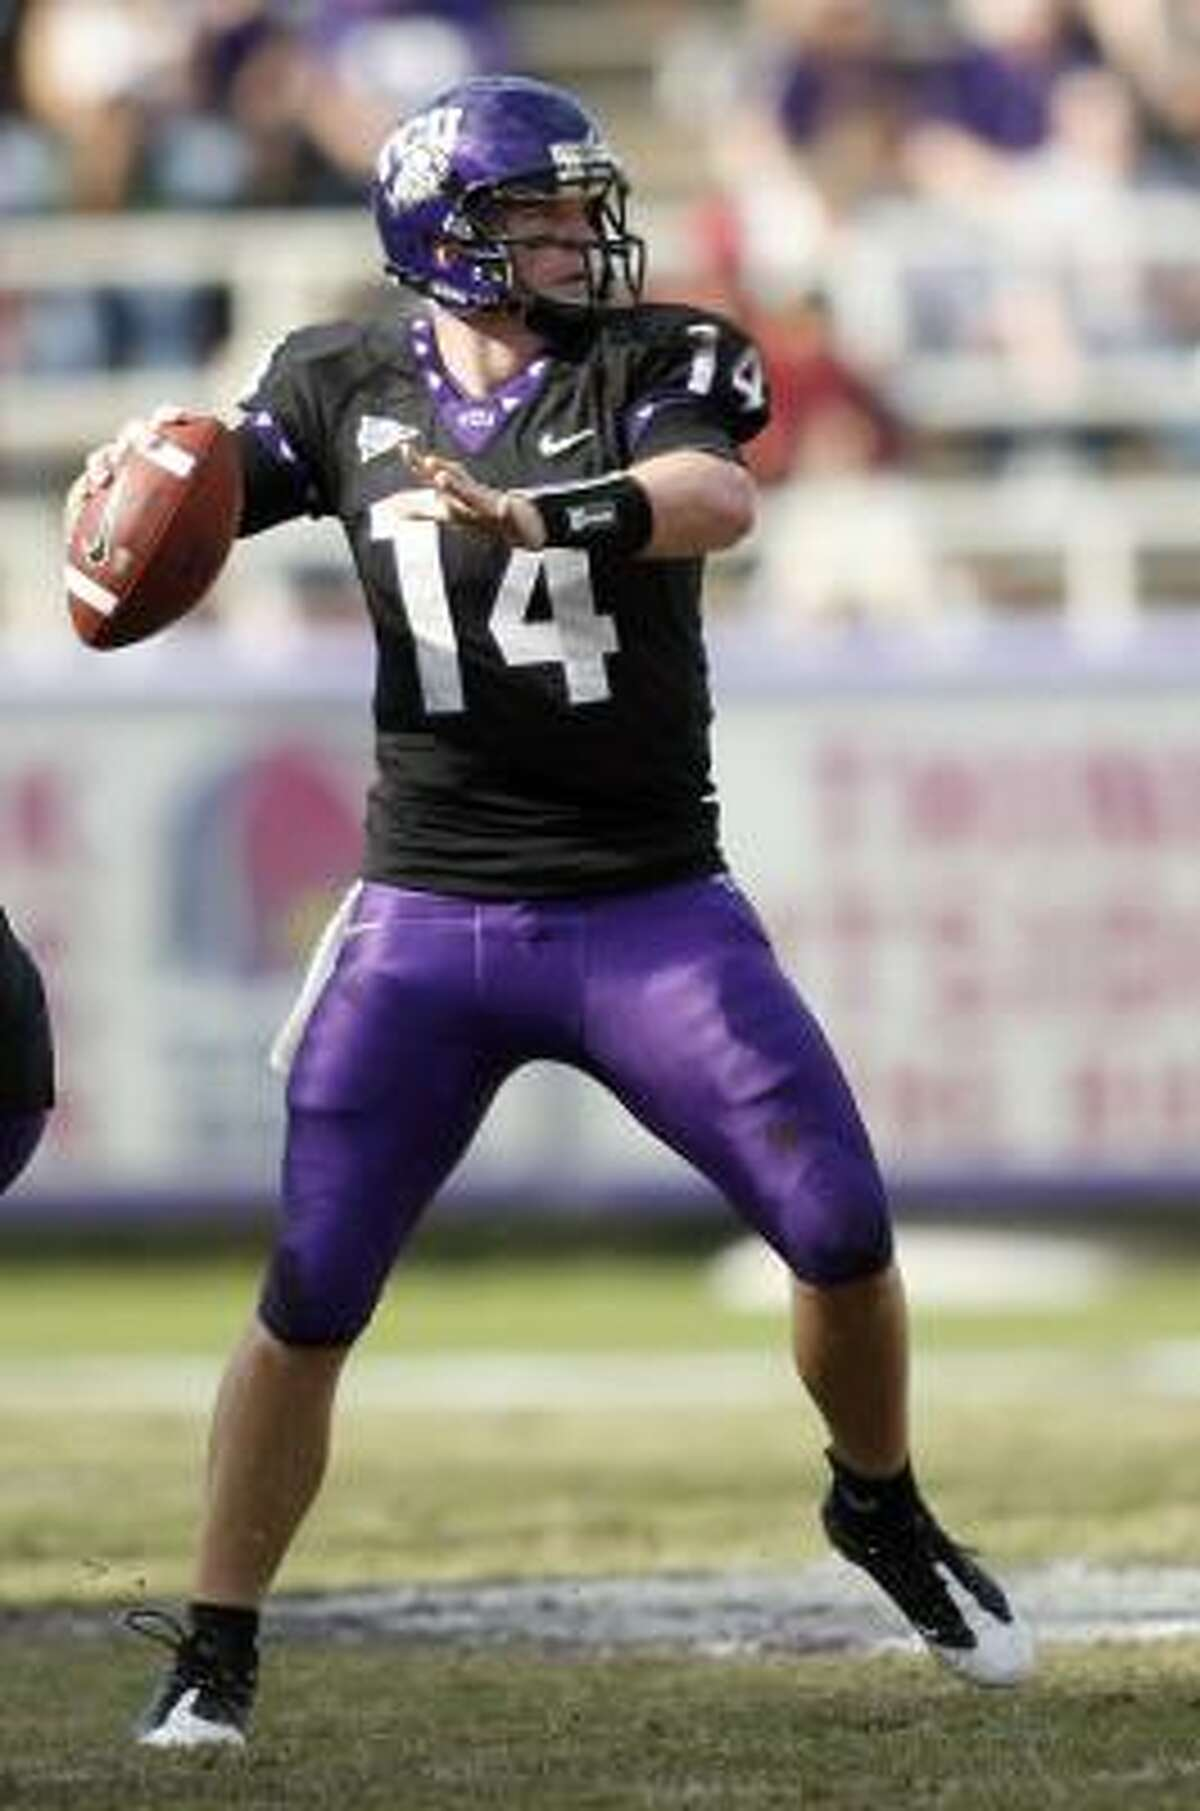 Horned Frogs quarterback Andy Dalton trails Sammy Baugh in career victories 29-23. But Dalton, still a junior, has one more season to surpass the TCU legend.